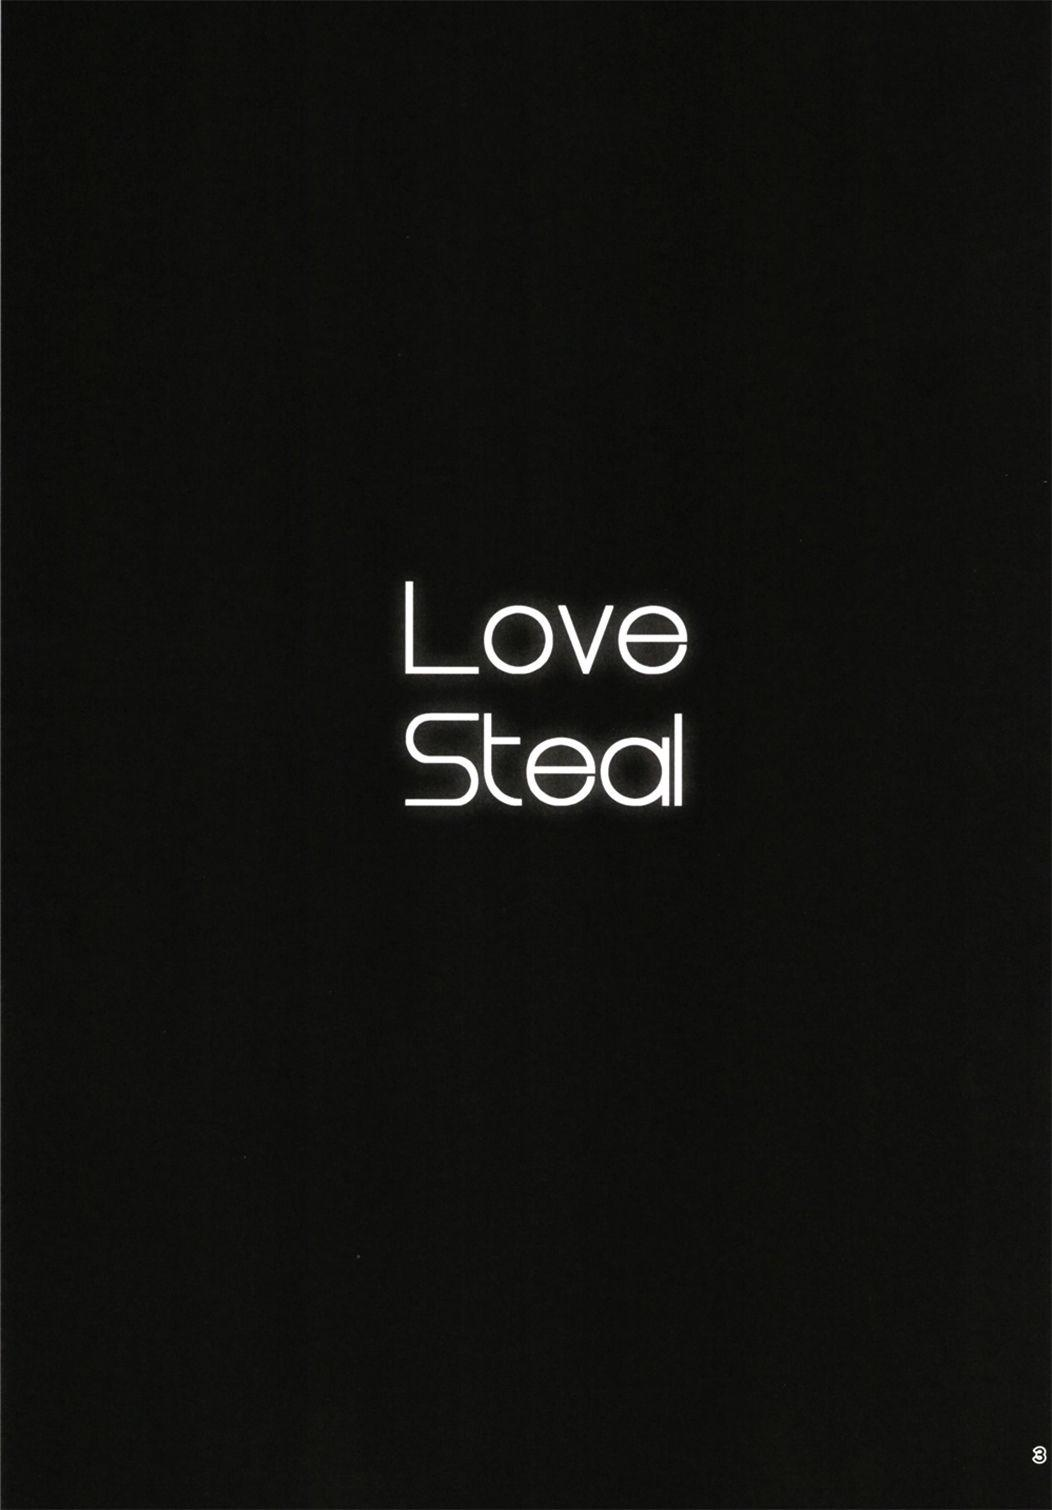 Love Steal 1